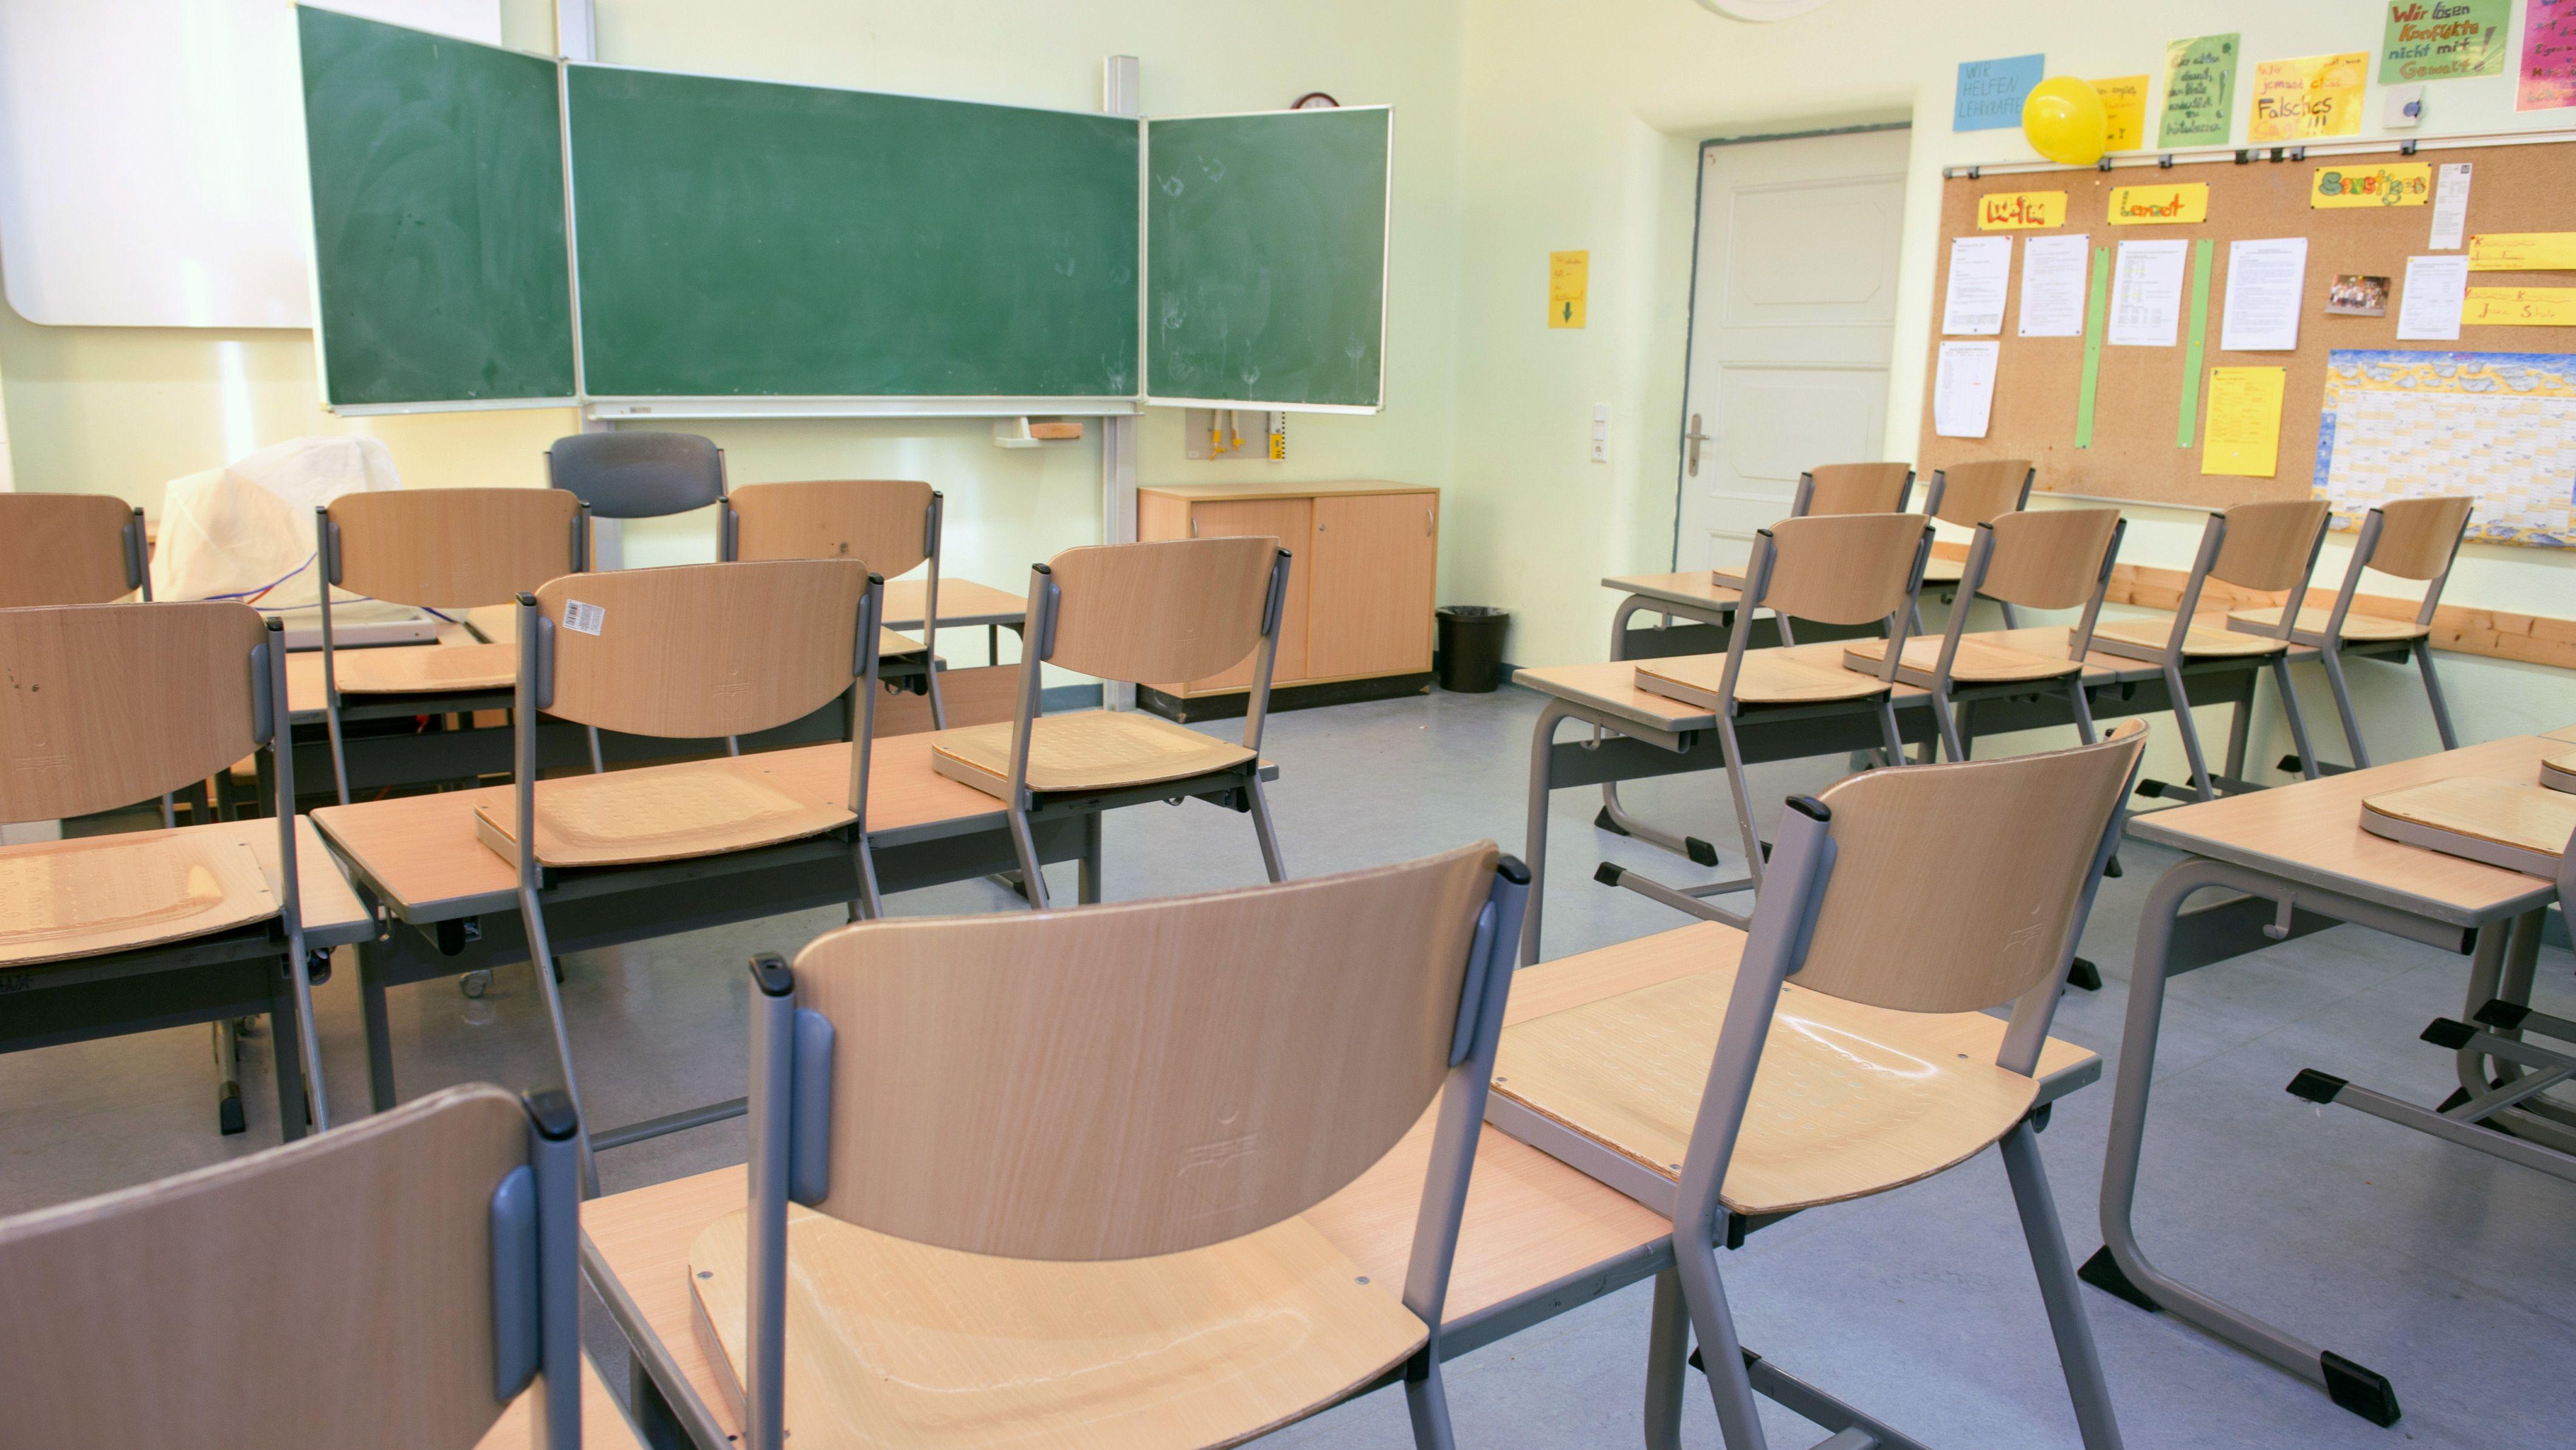 leeres Klassenzimmer(Symbolbild)